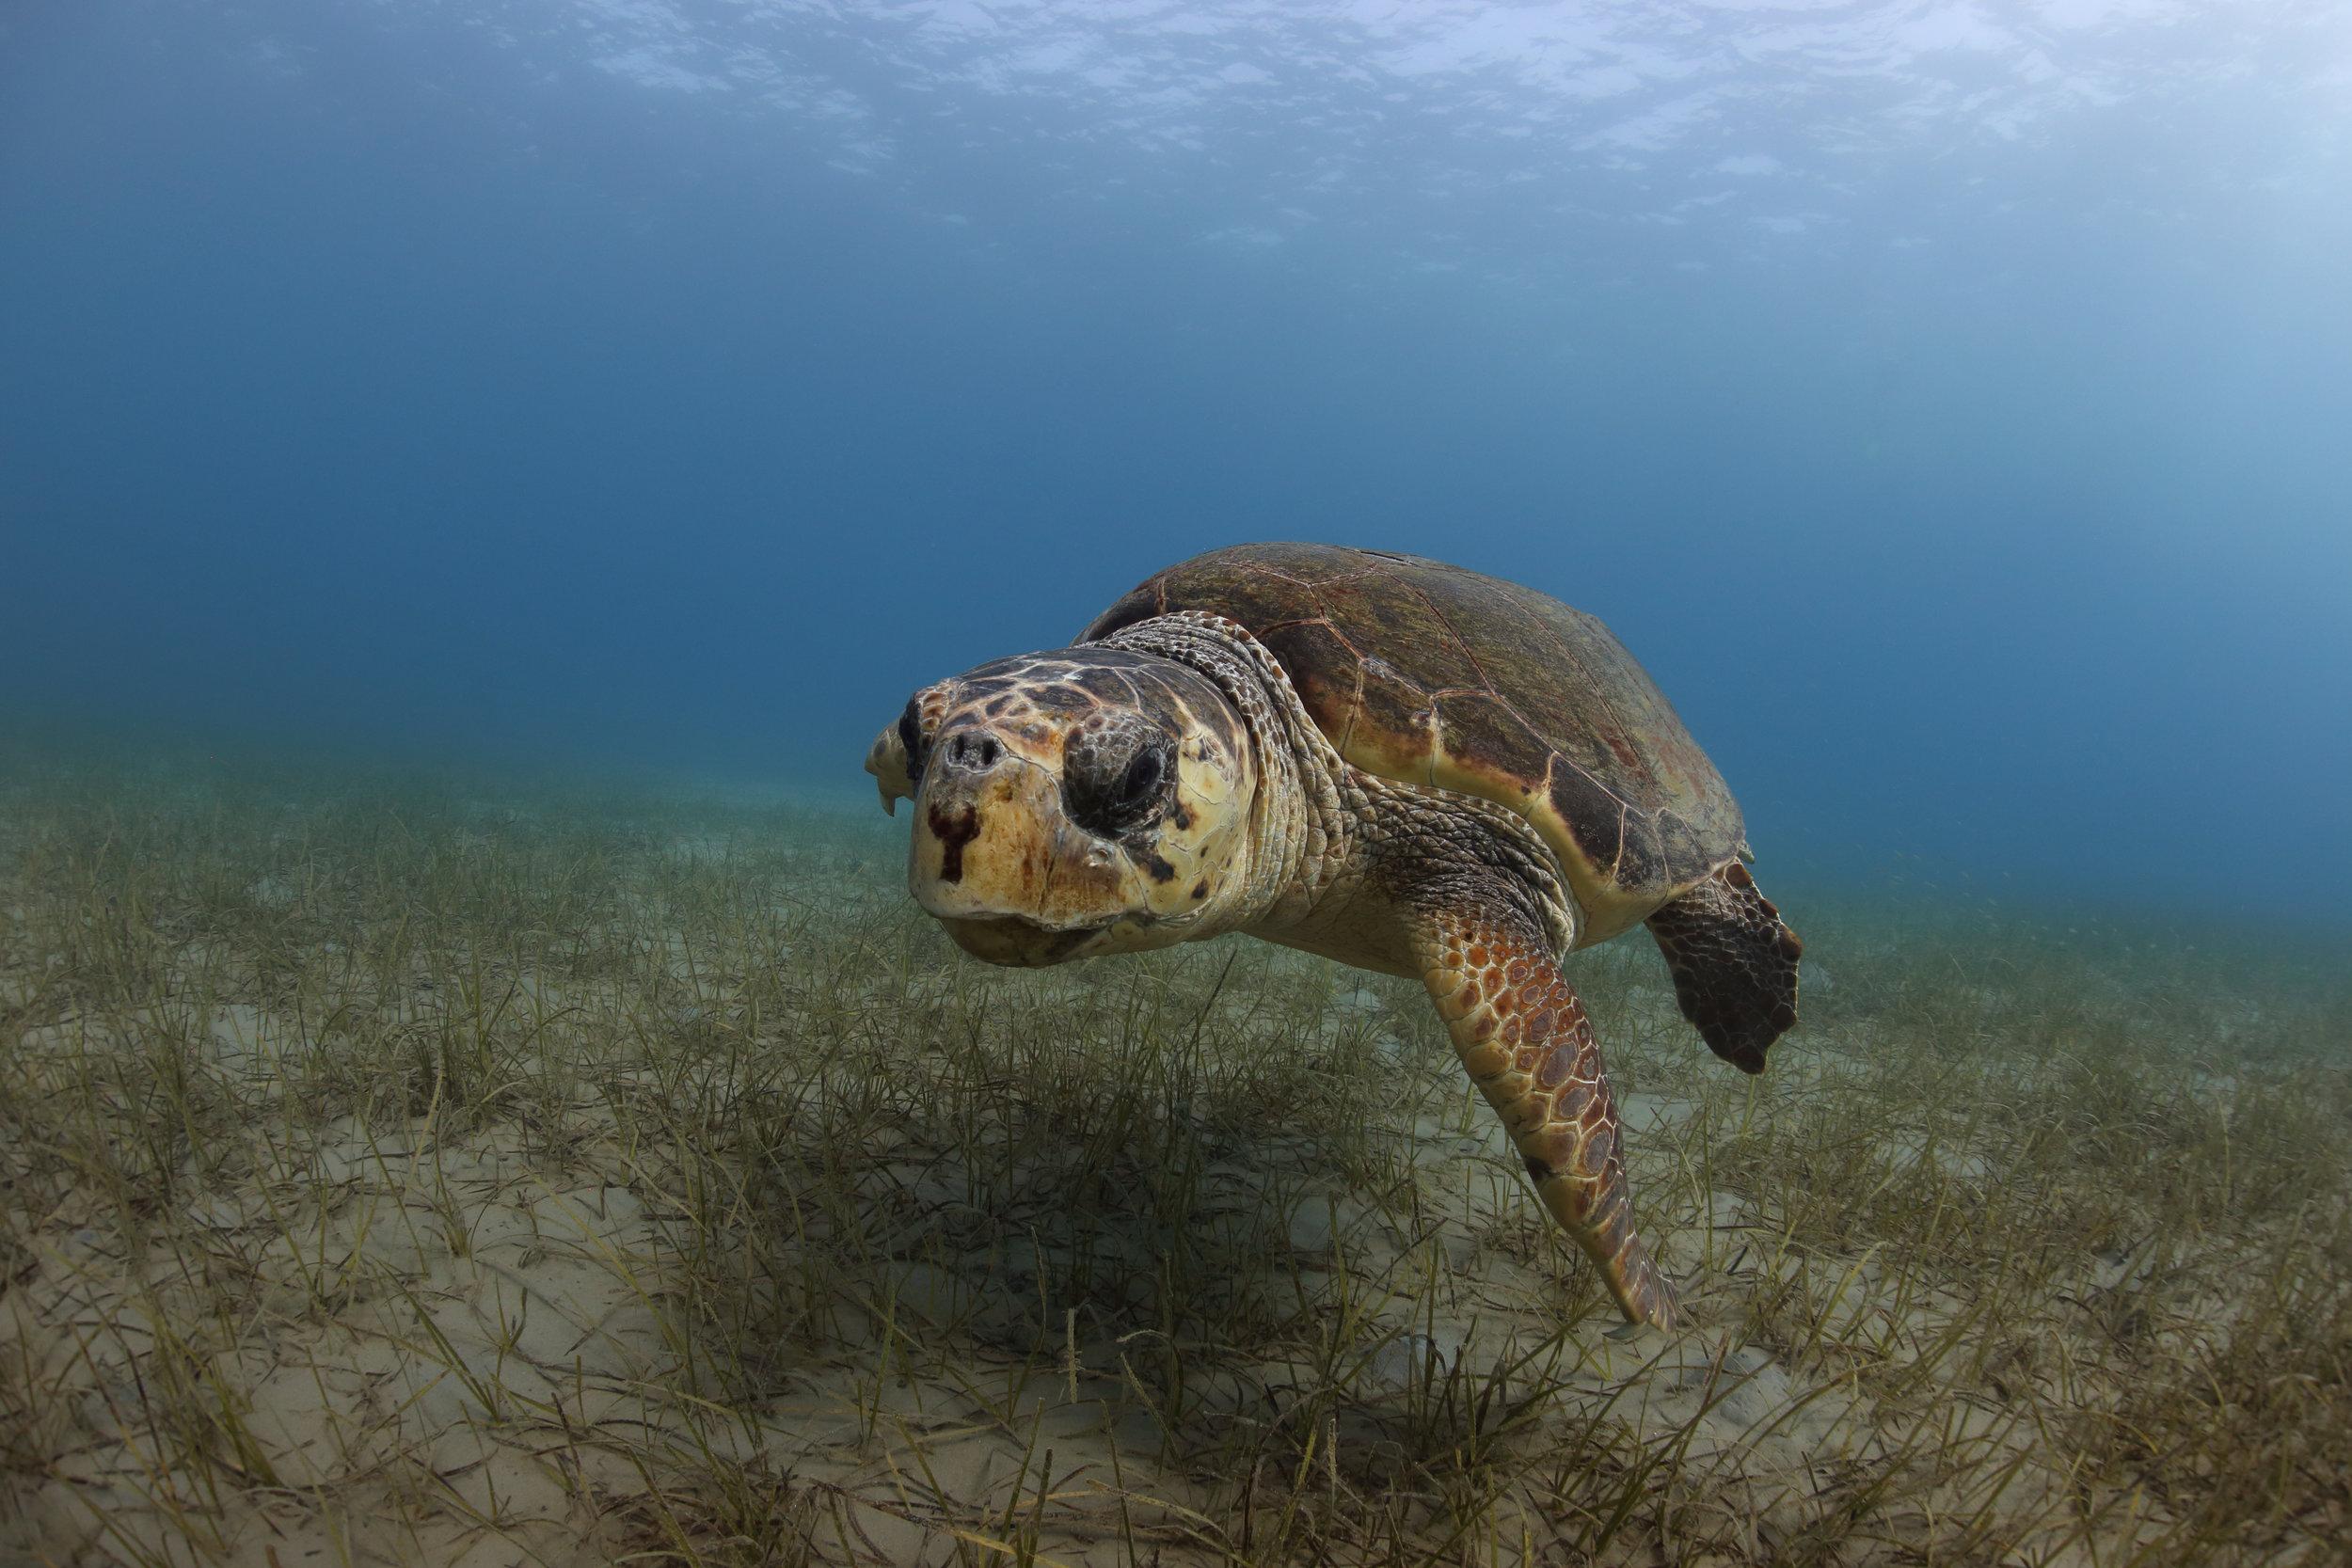 Loggerhead turtle © Kostas Papafitsoros